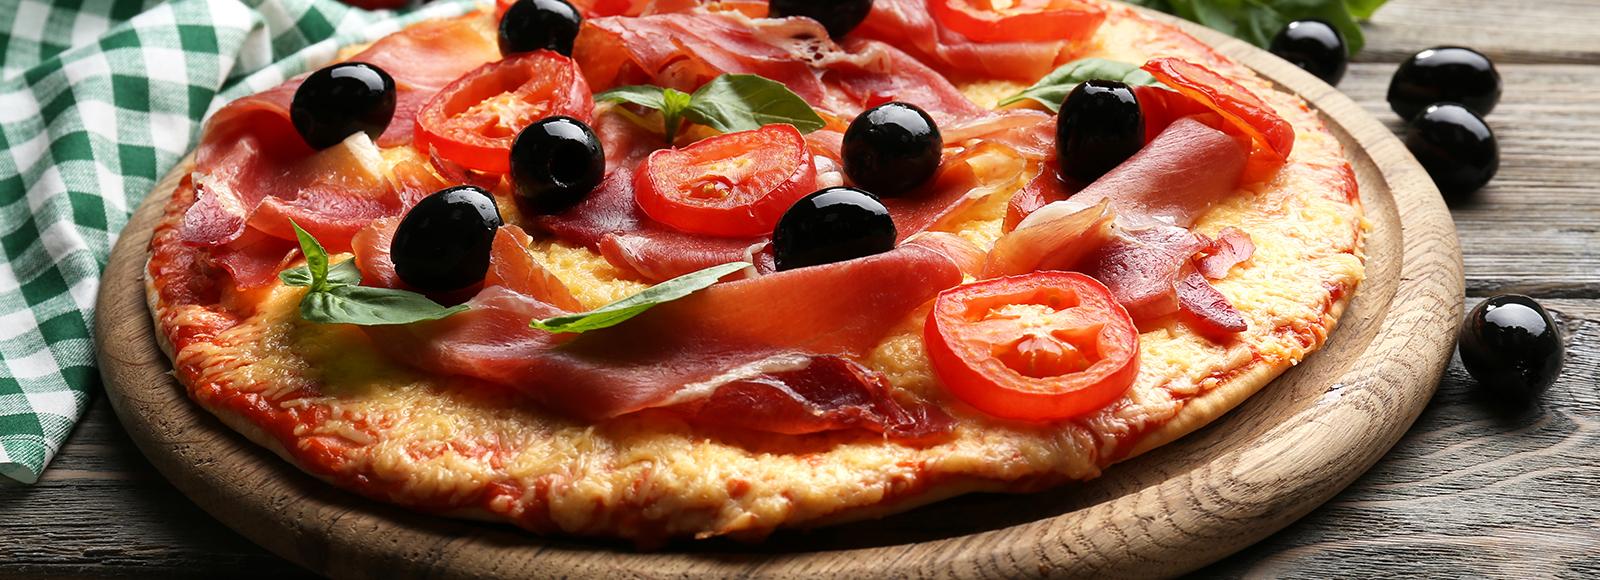 Bella Pizza Bella Pizza Handsworth Takeaway Order Online